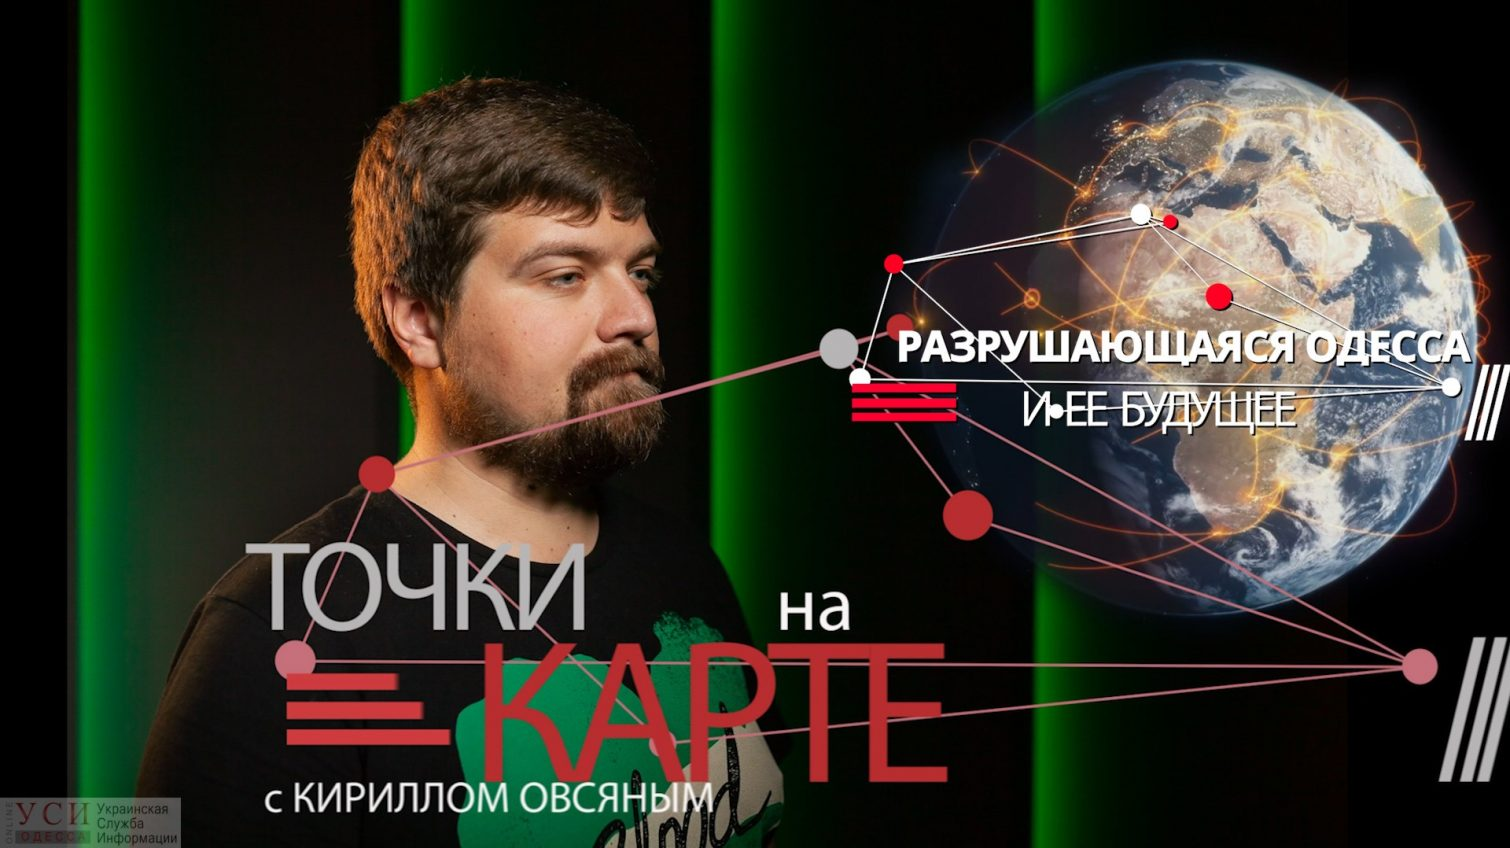 «Точки на карте»: разрушающаяся Одесса и ее будущее (карта, фото, видео) «фото»